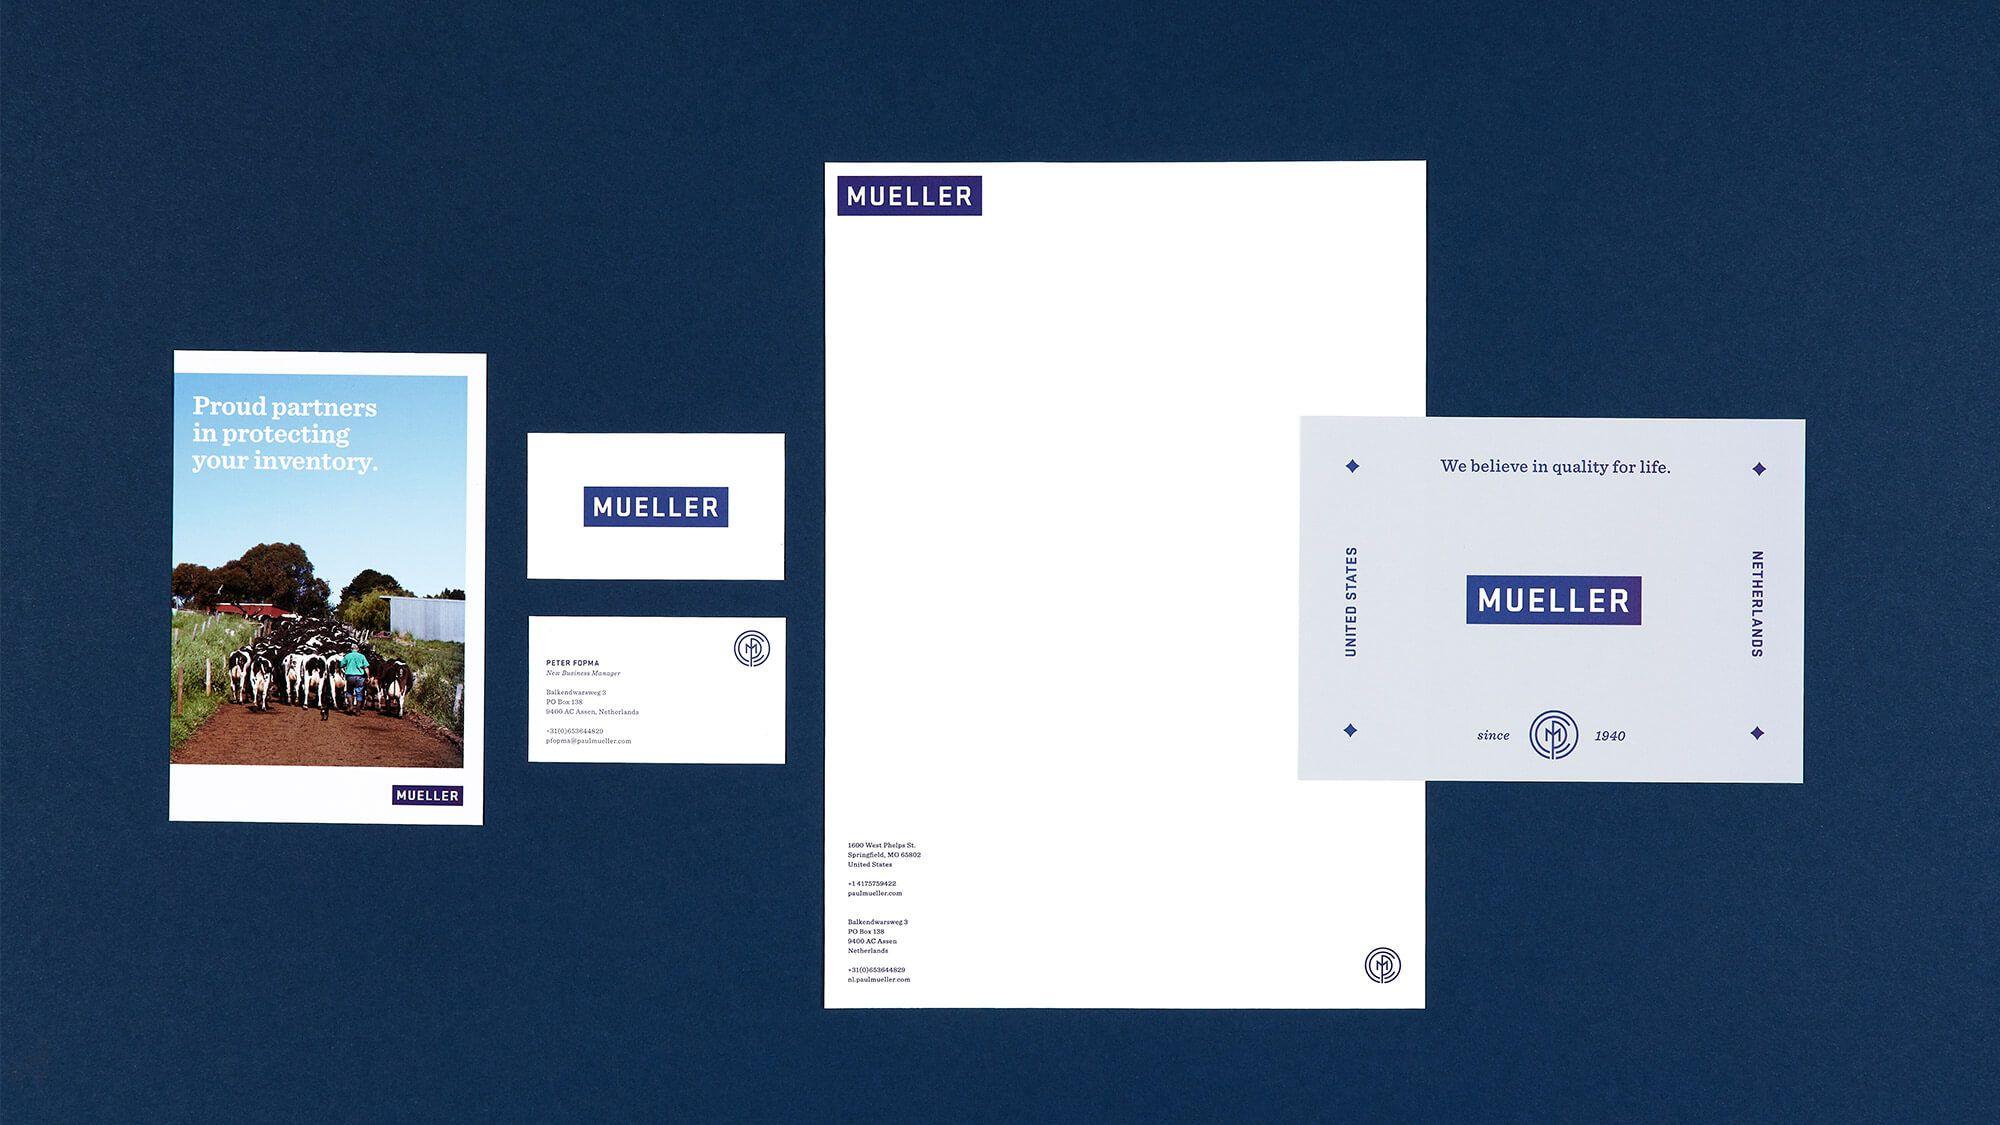 Paul Mueller Company Company Branding Branding Design Branding